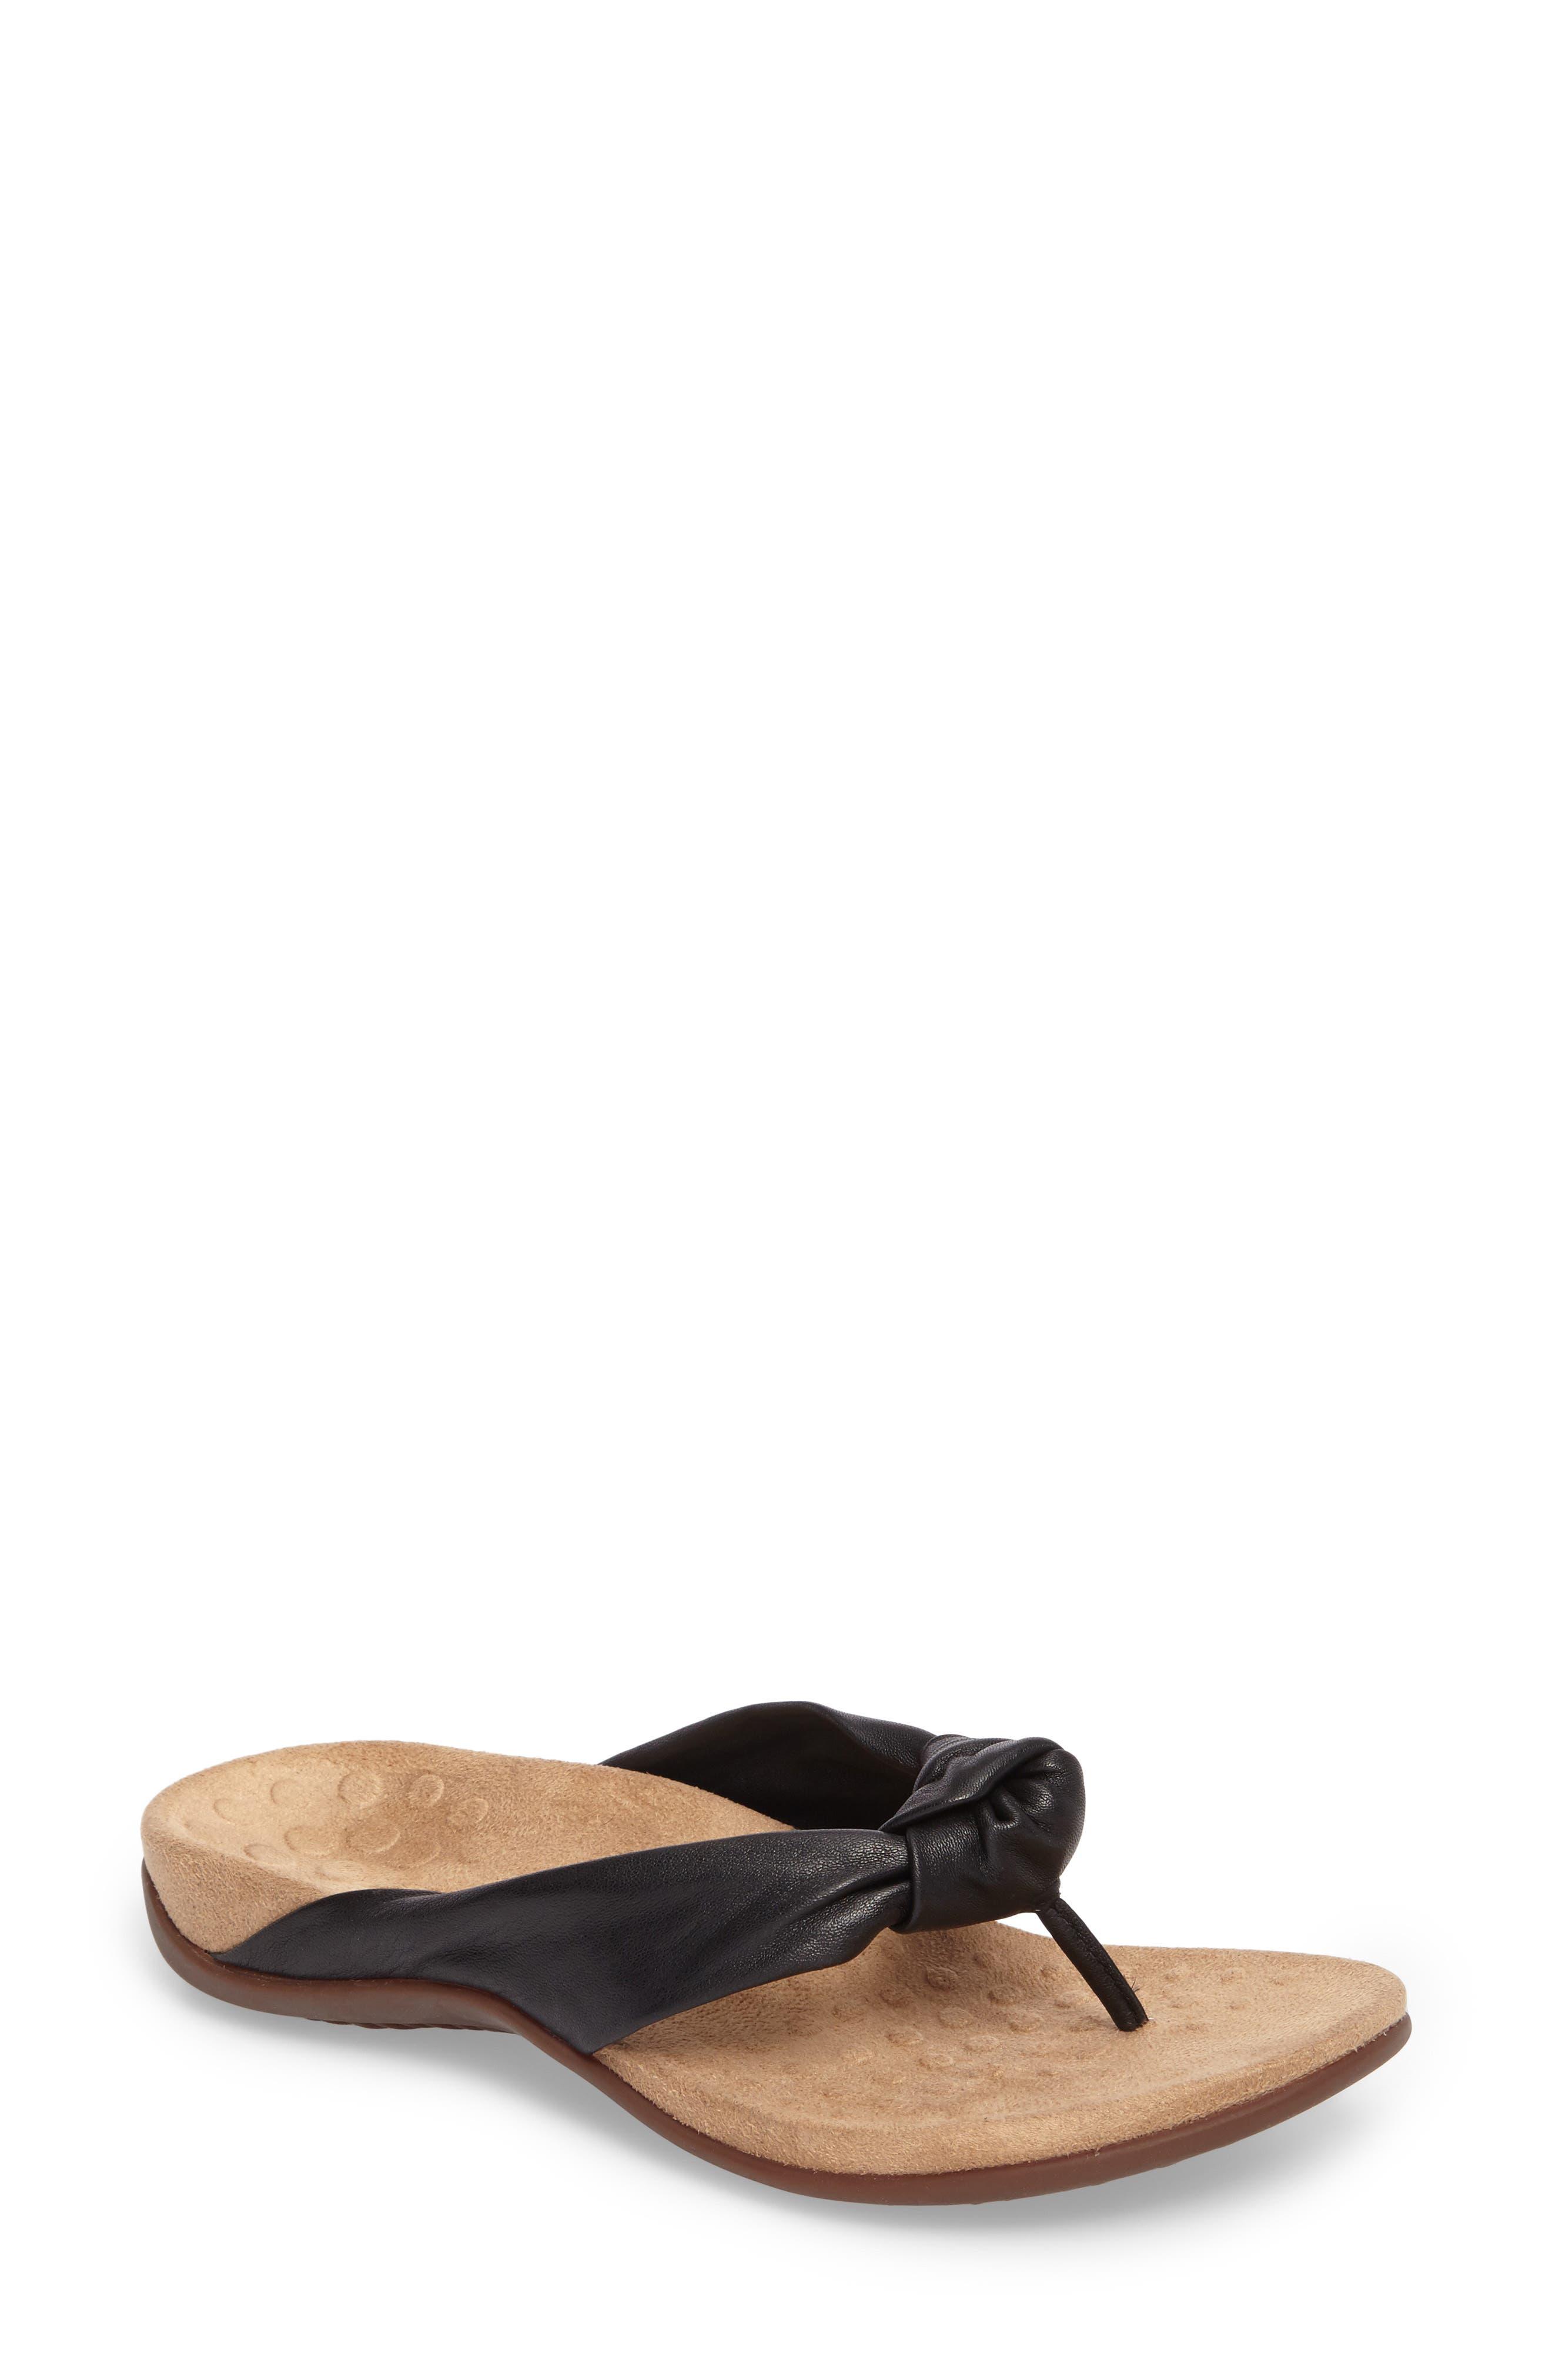 Pippa Flip Flop,                         Main,                         color, Black Leather